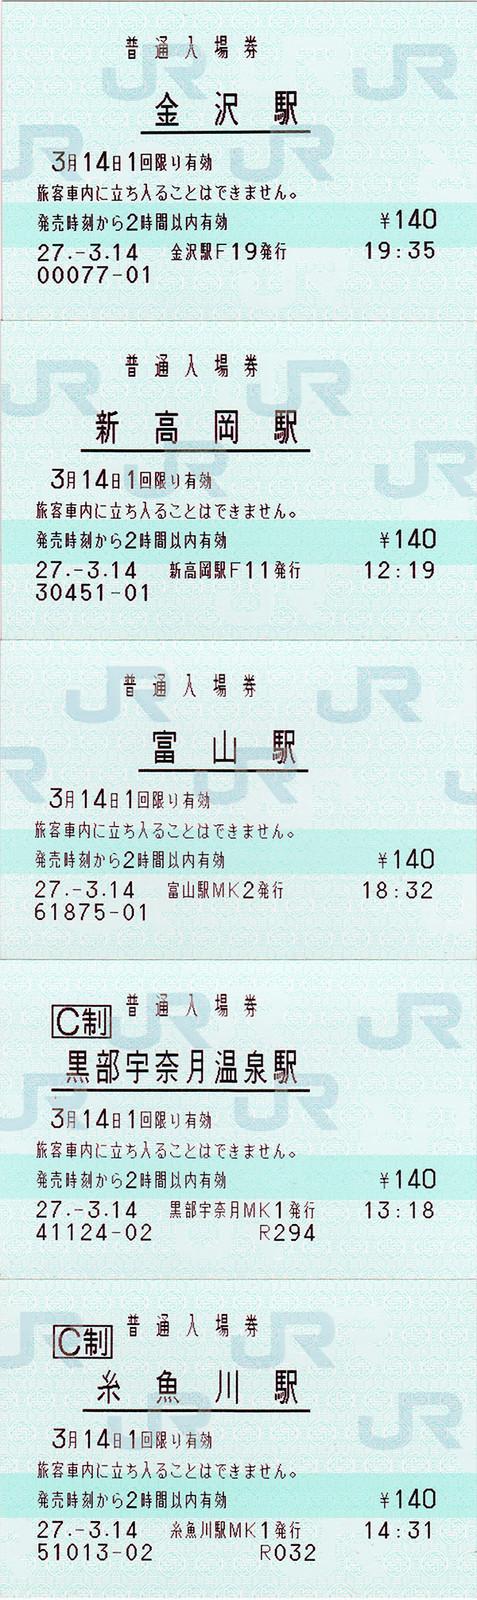 201505170001